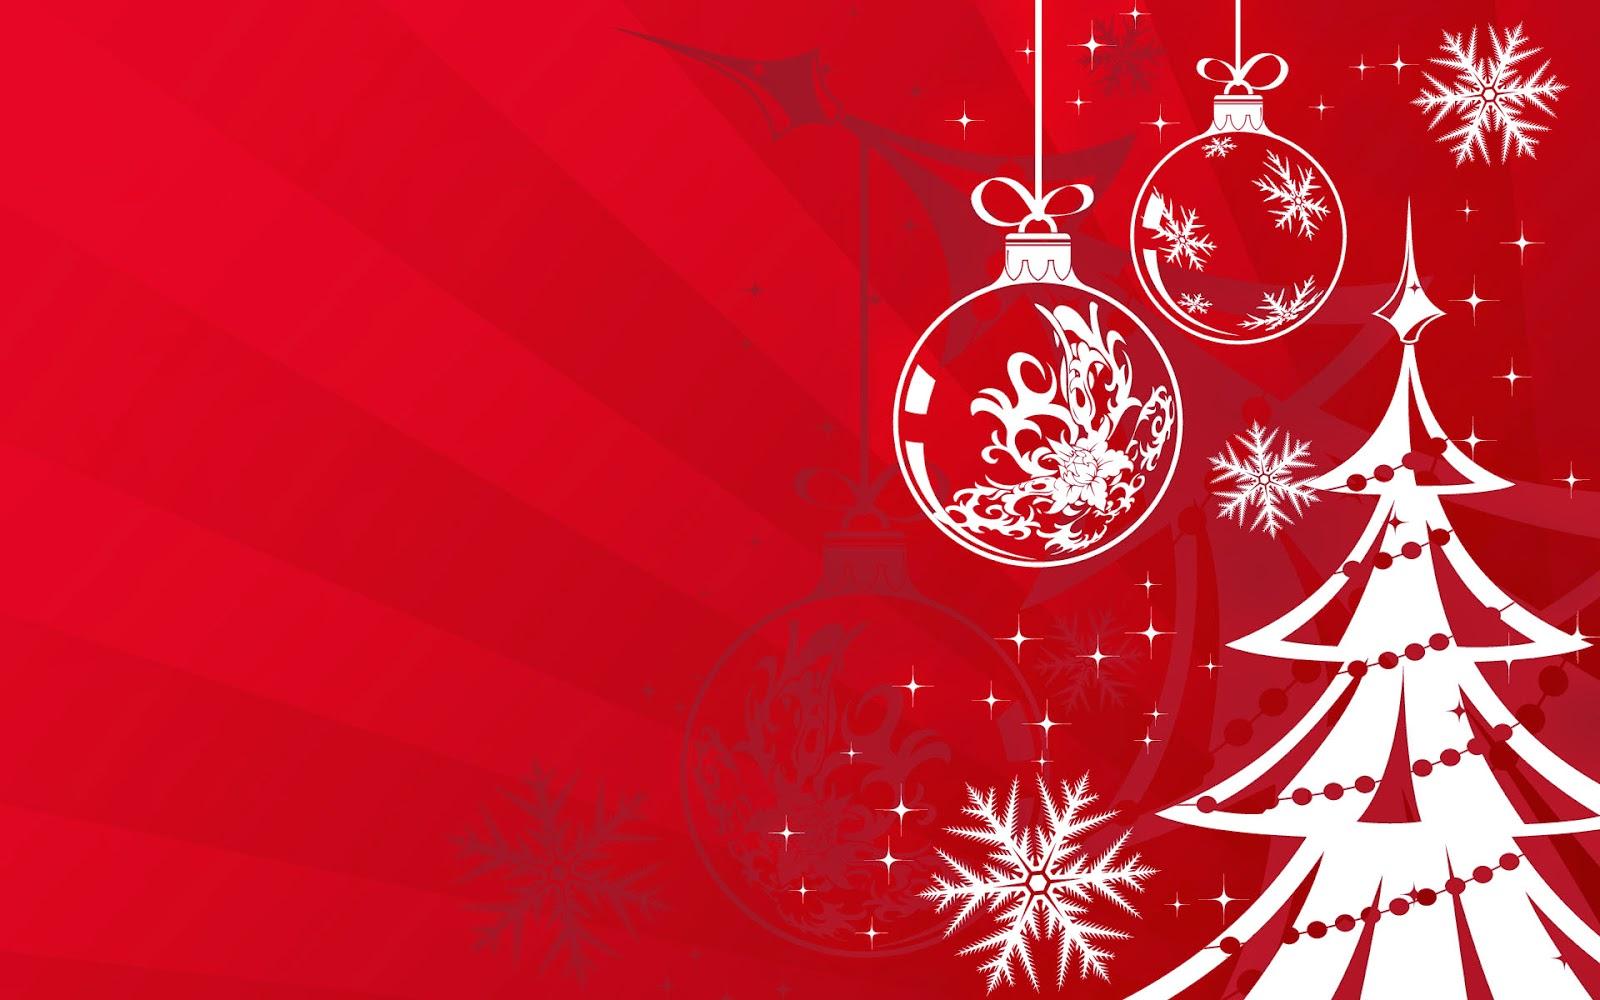 beautiful-stylish-christmas-tree-designs-abstract-vector-graphics-stock-image-free-download.jpg